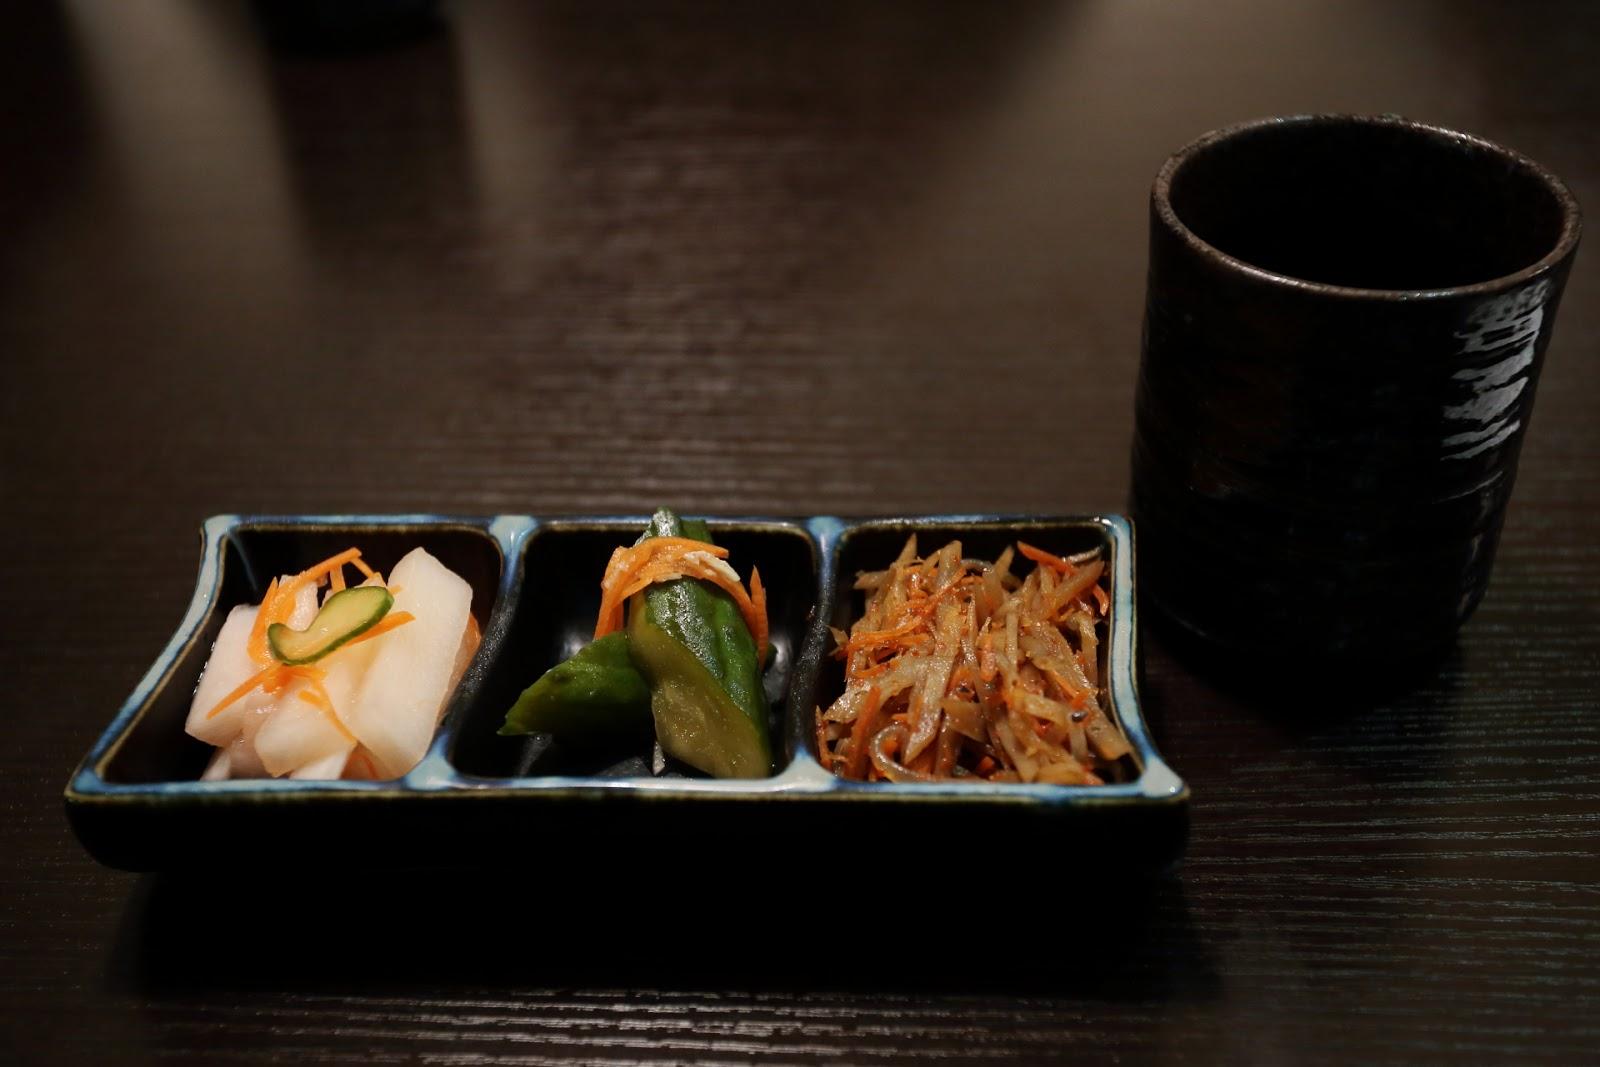 JOH Dining Kitchen(搬遷更名為蕾bistro)|簡單卻不失平淡的日式洋食風味 - 小食日記